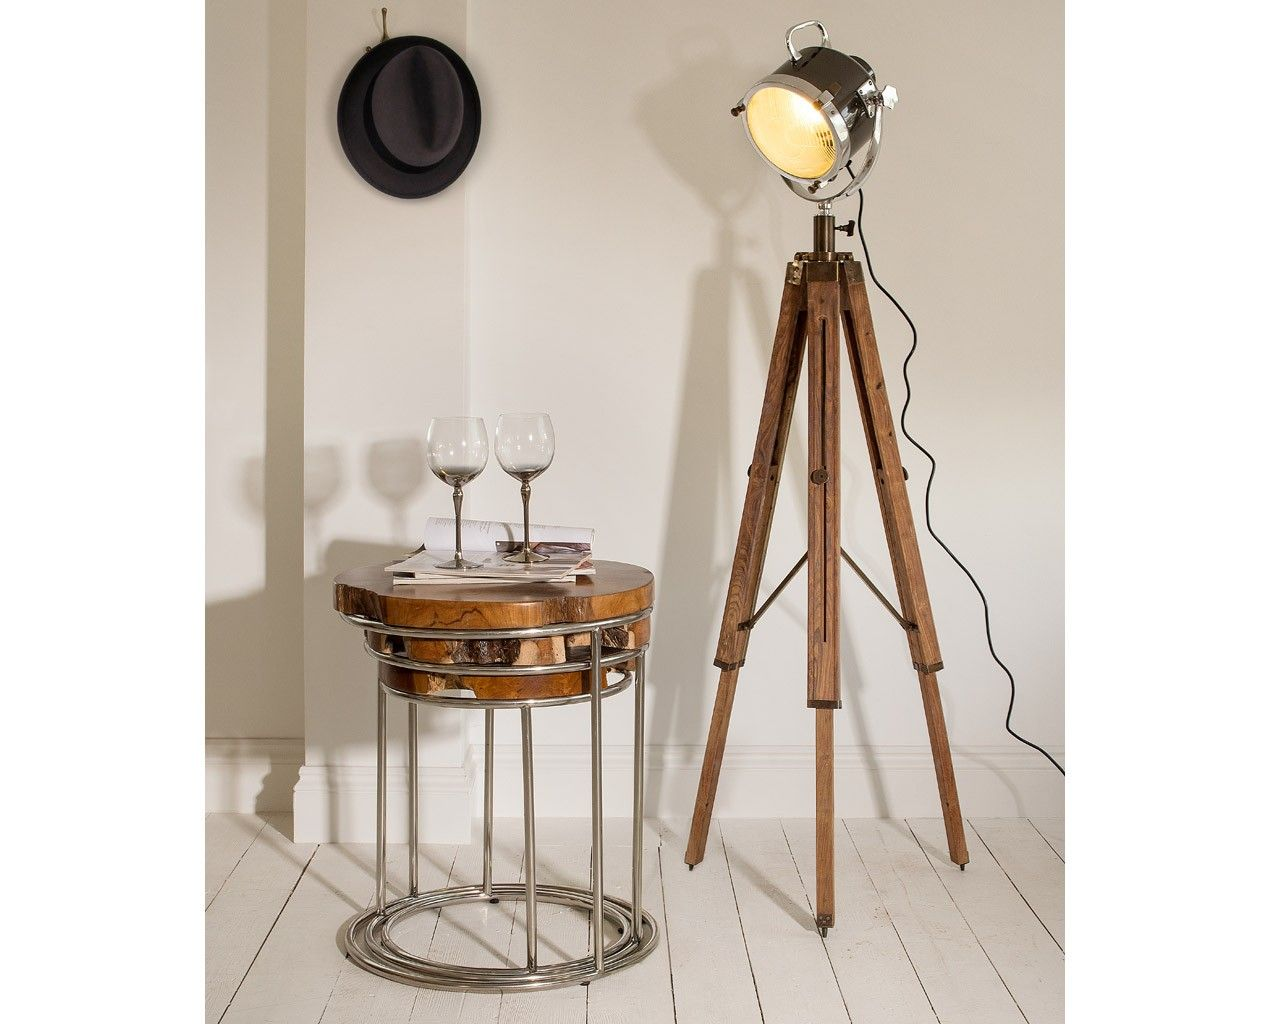 Spotlight Tripod Lamp Floor standing lamps, Nautical